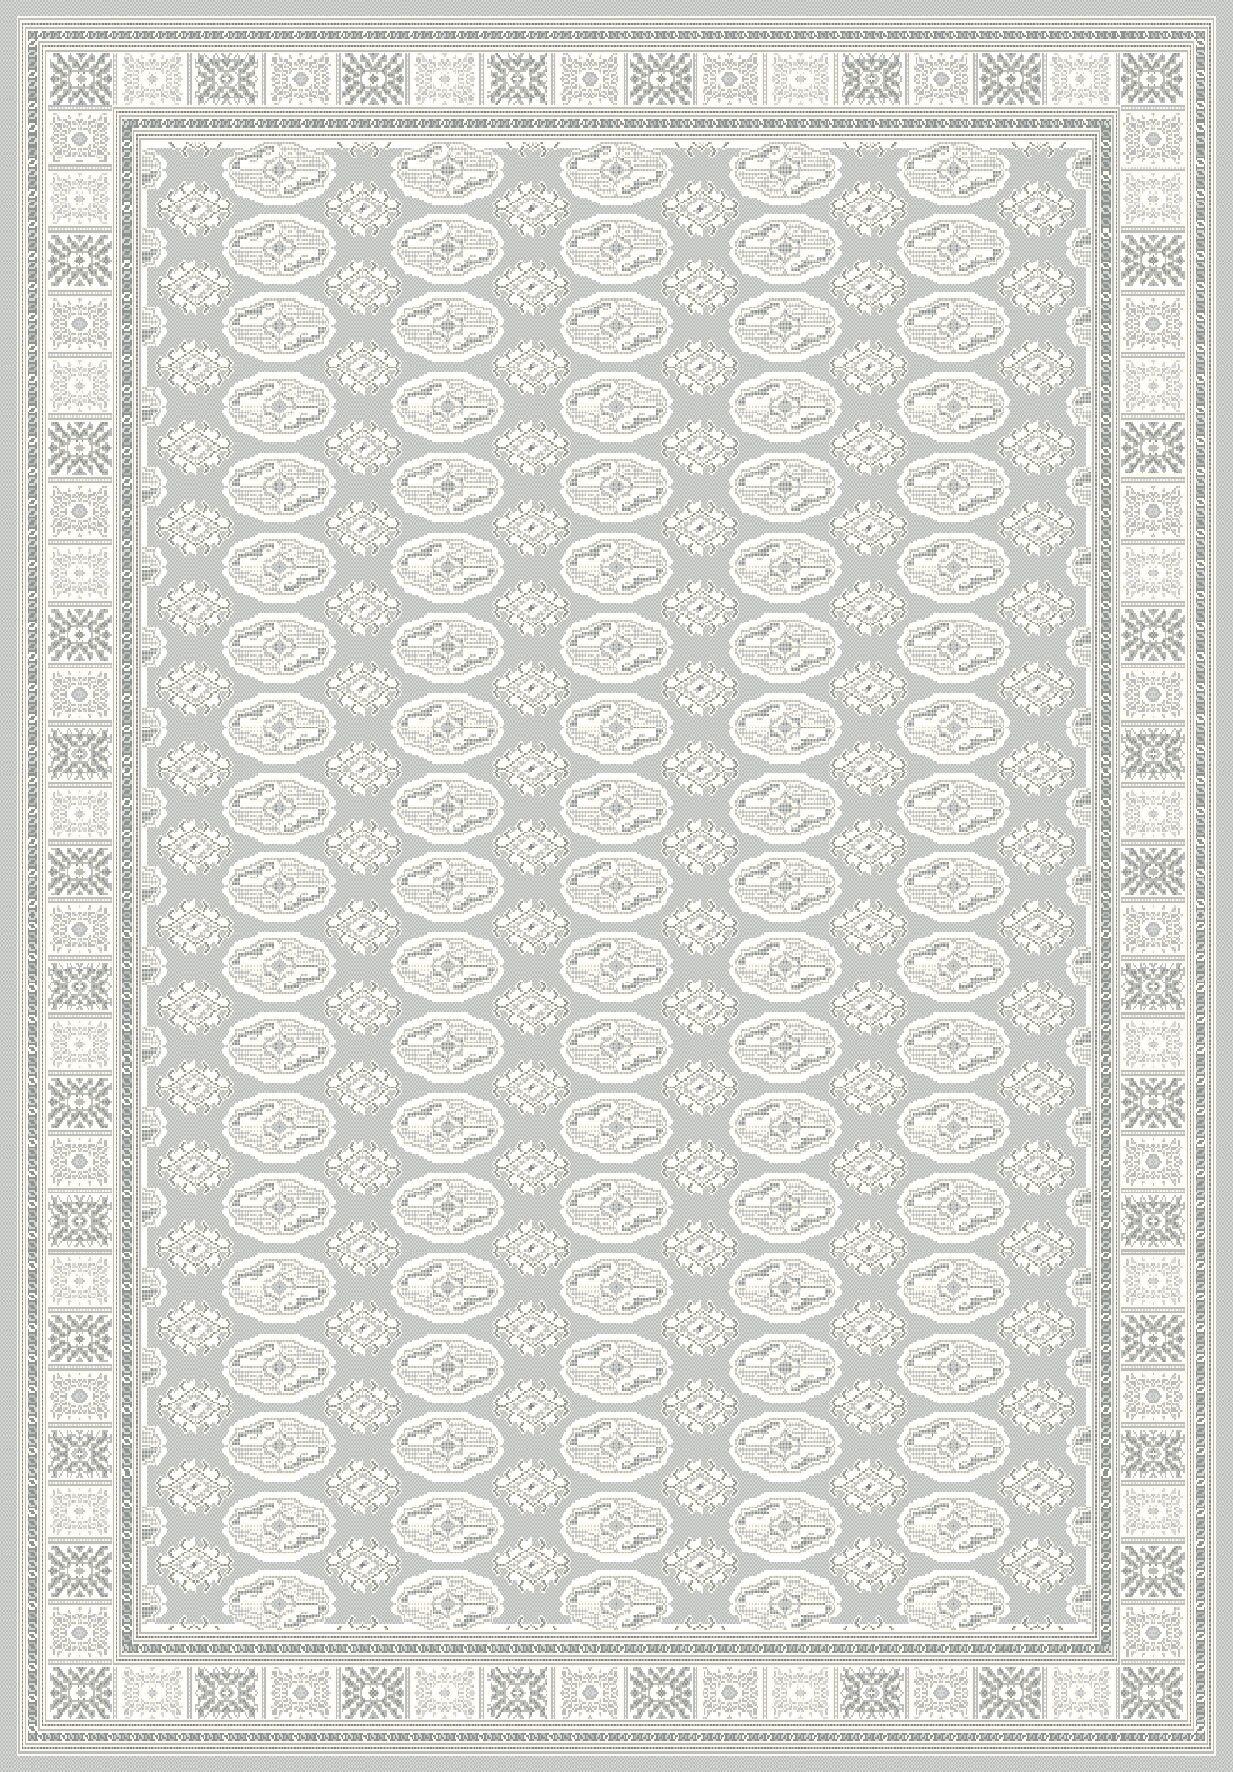 Florentia Dark Gray Area Rug Rug Size: Rectangle 6'7